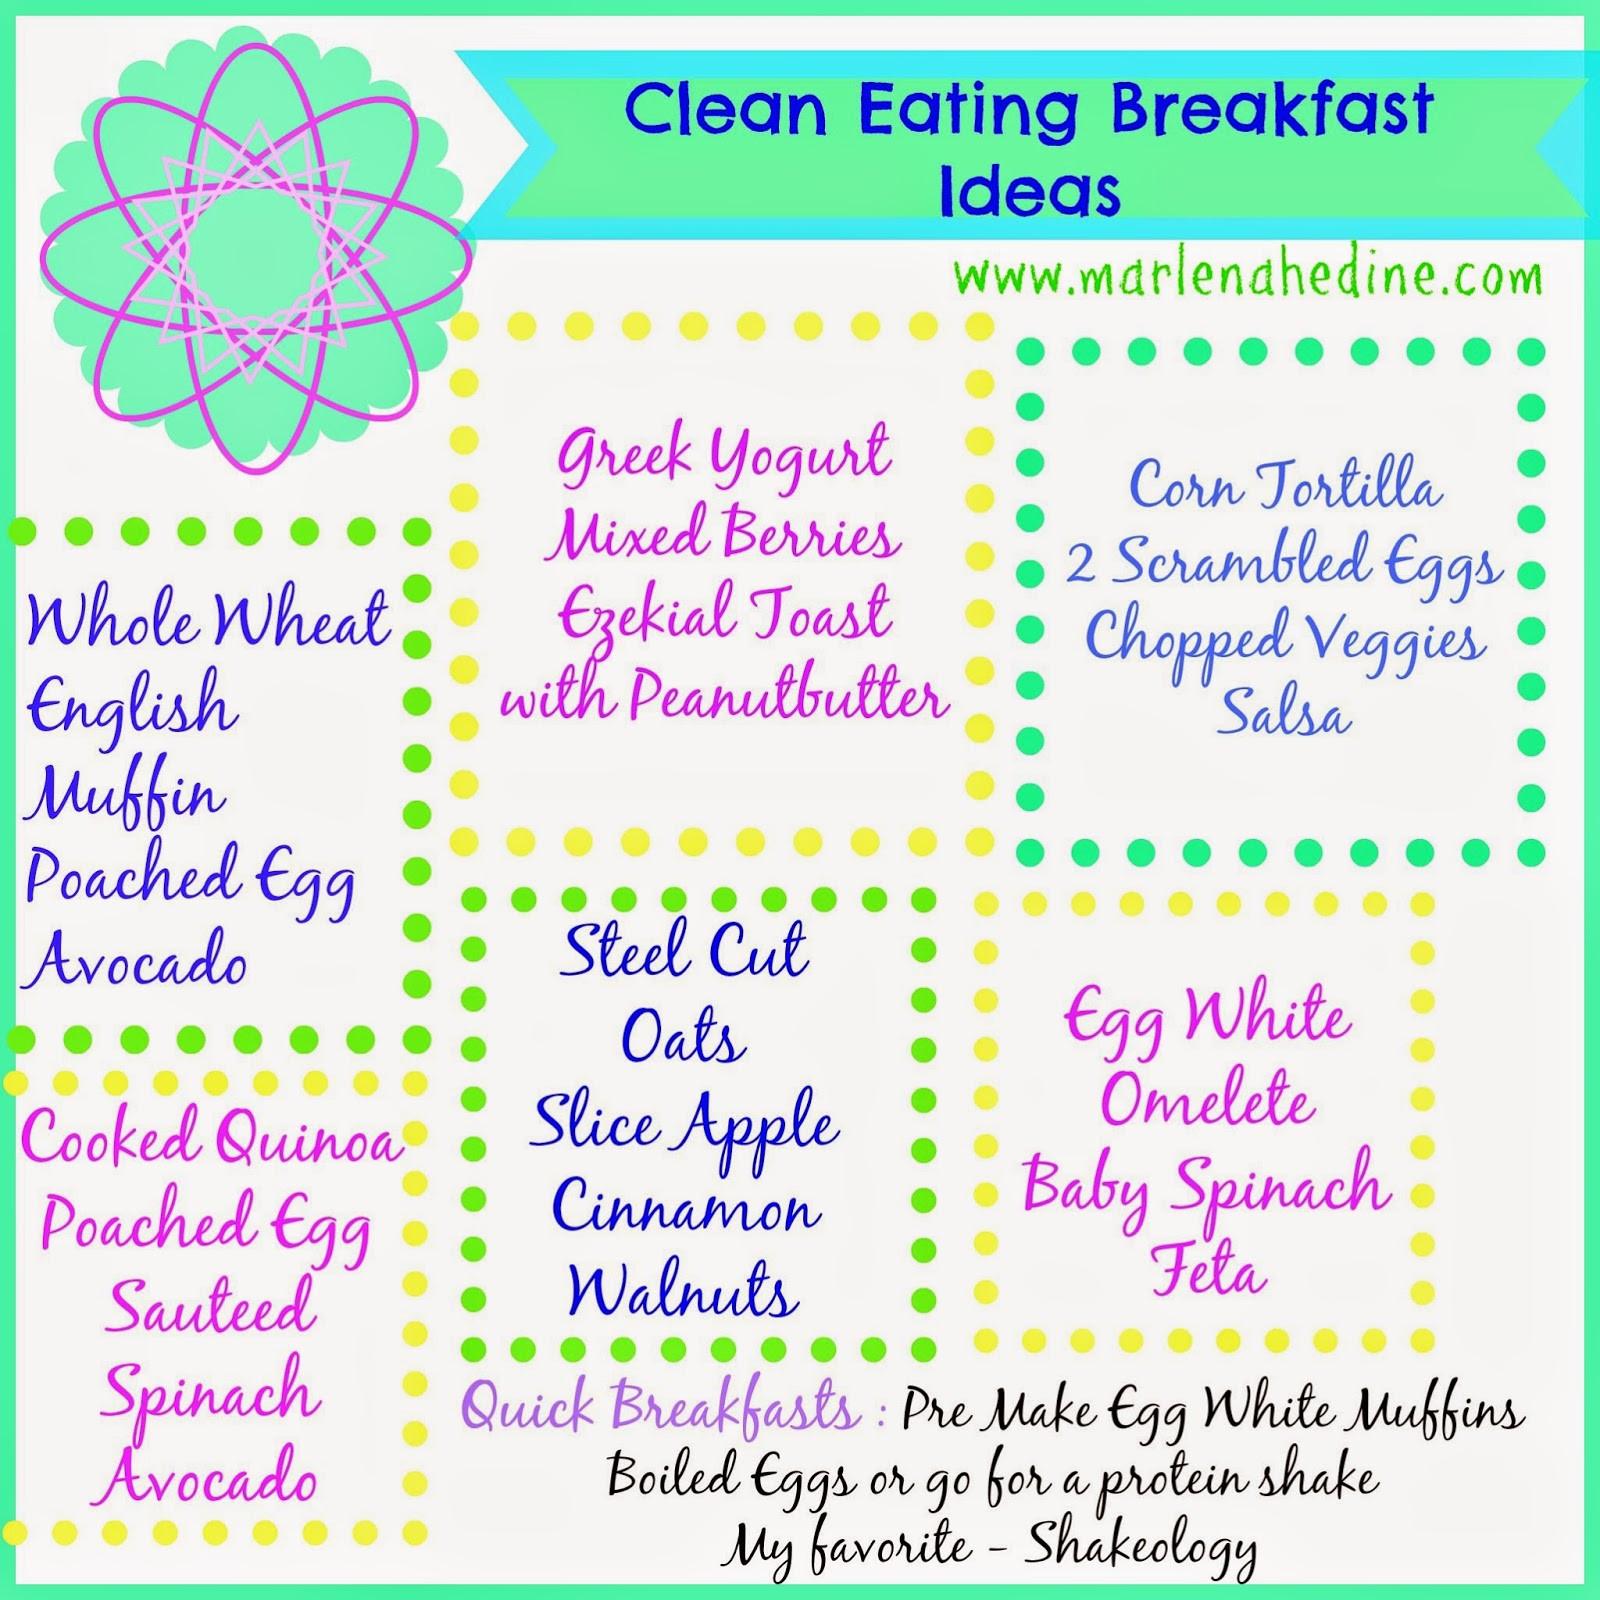 Clean Eating Breakfast Ideas  Eating Healthy Eating Healthy Ideas